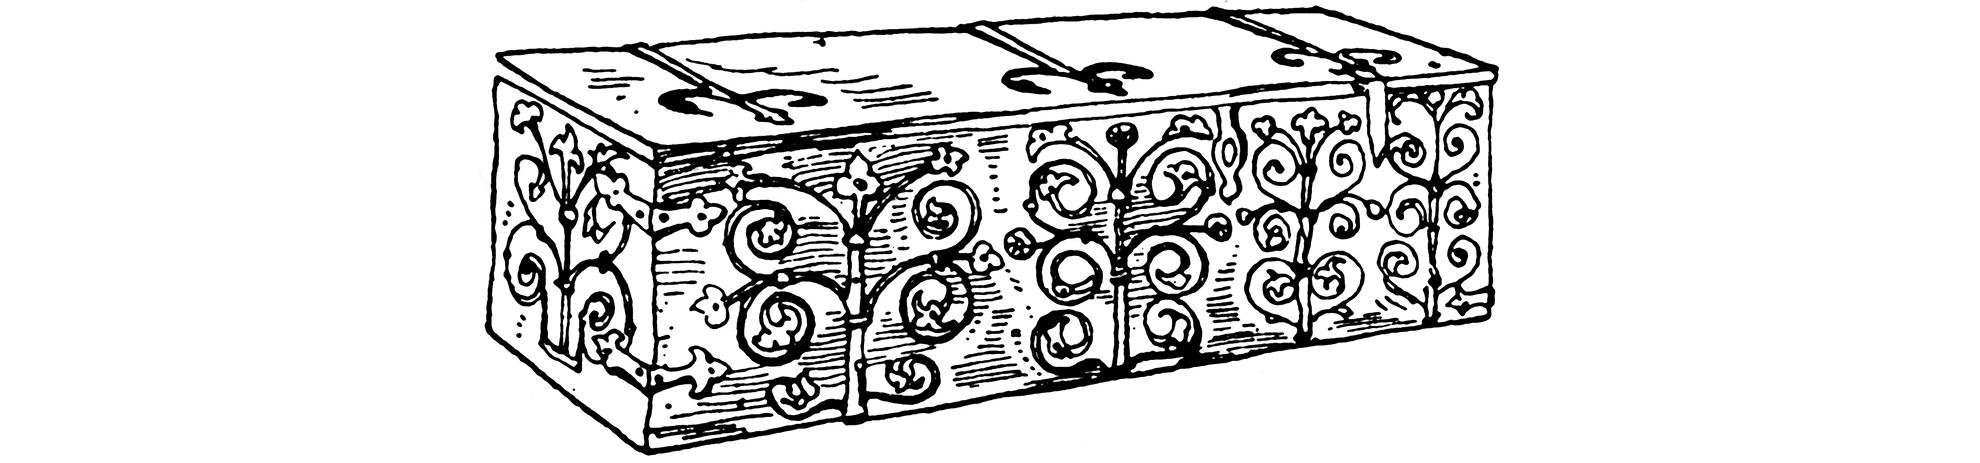 ornate chest